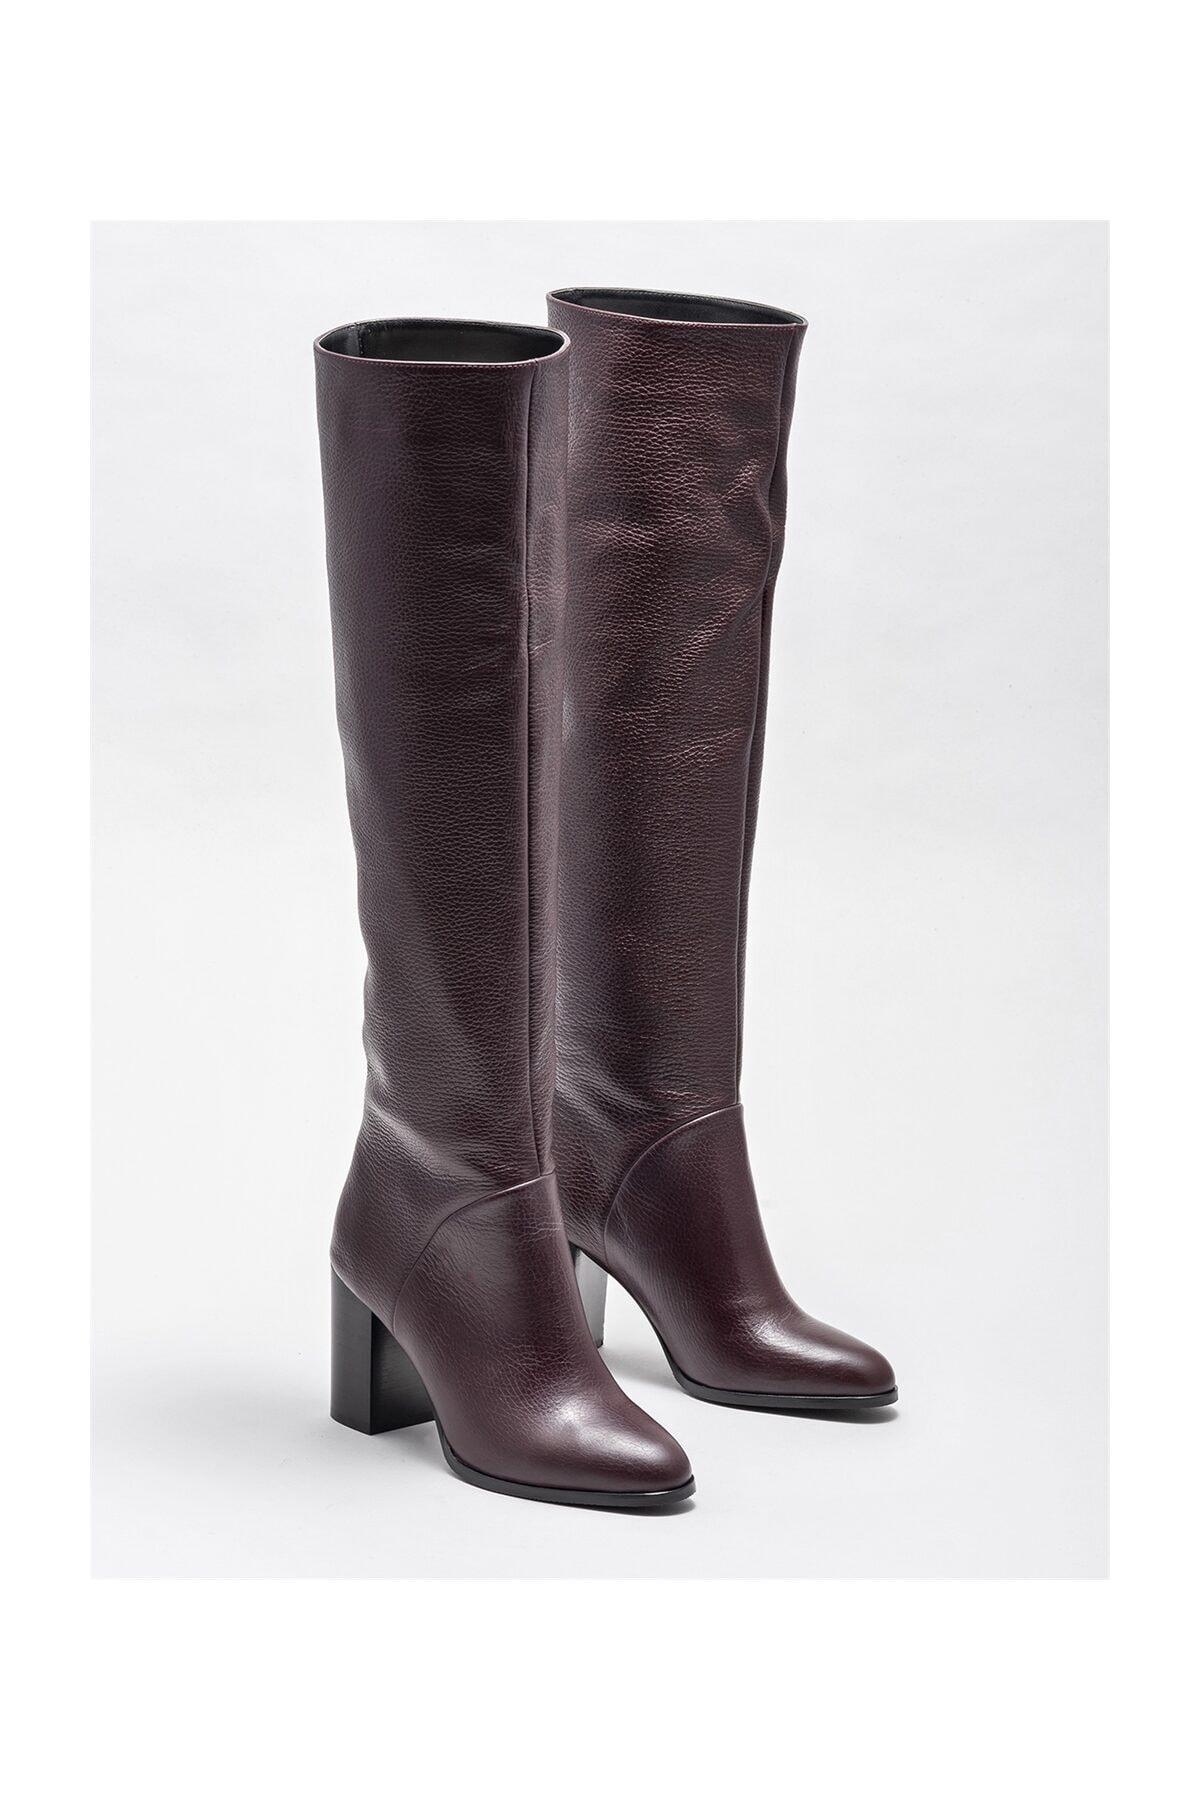 Elle Shoes Ranseys Kadın Çizme 20KTO18412 2